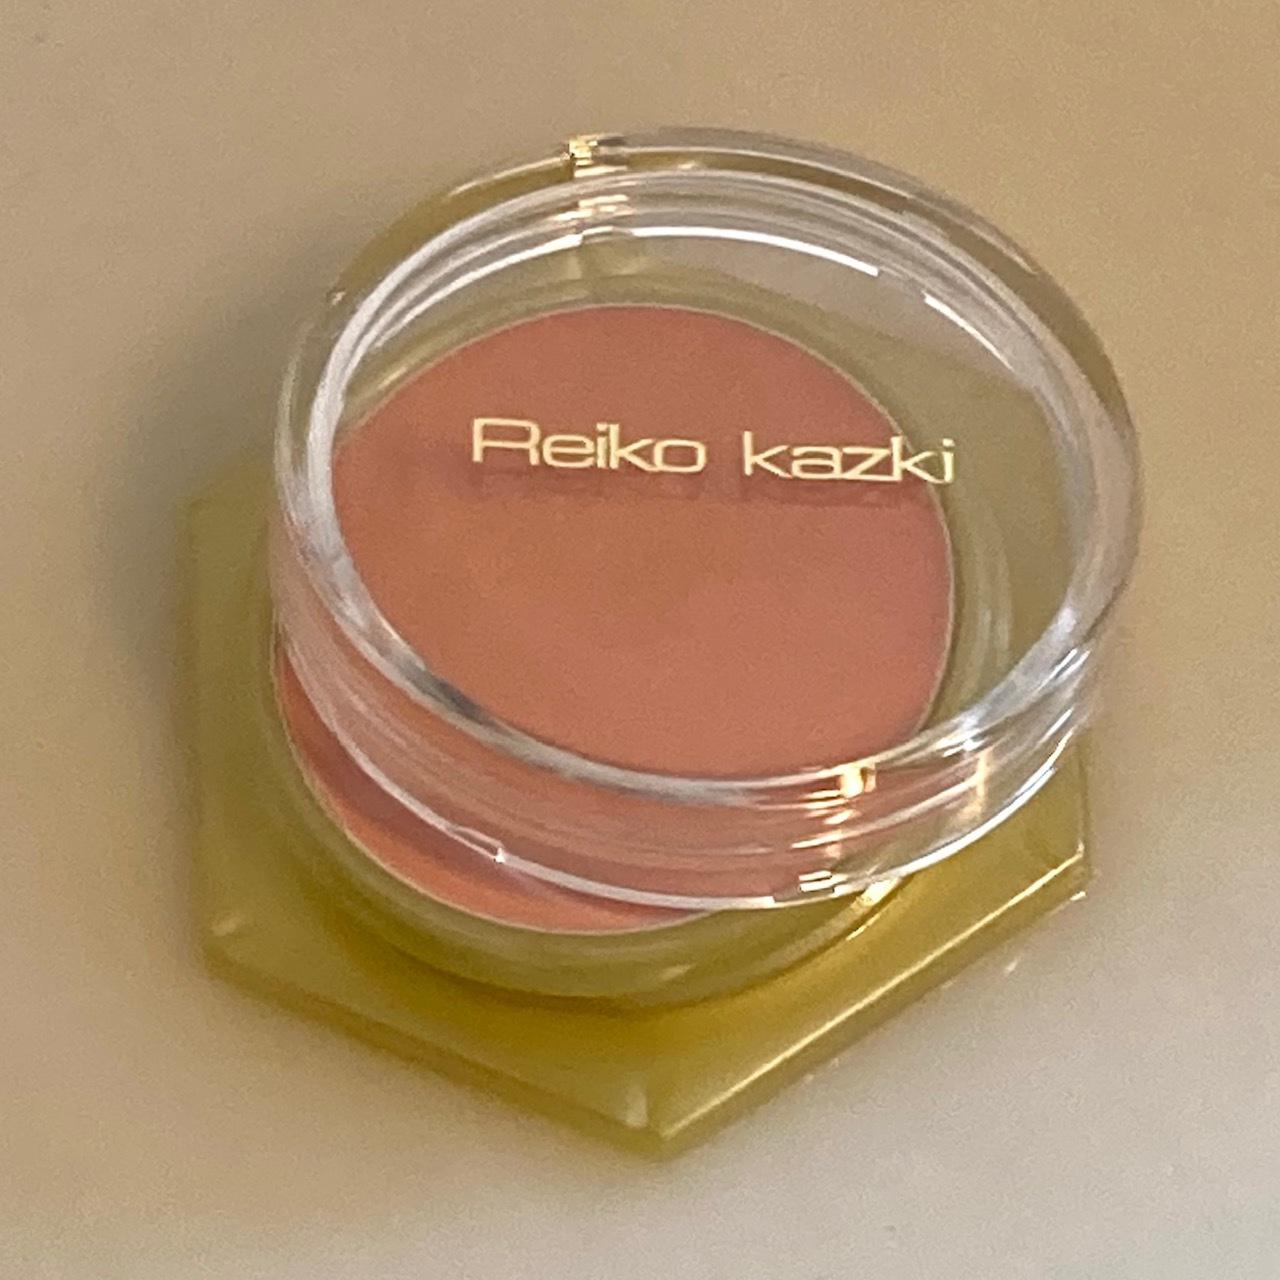 Reiko Kazki のカバーリングファンデーション オレンジ